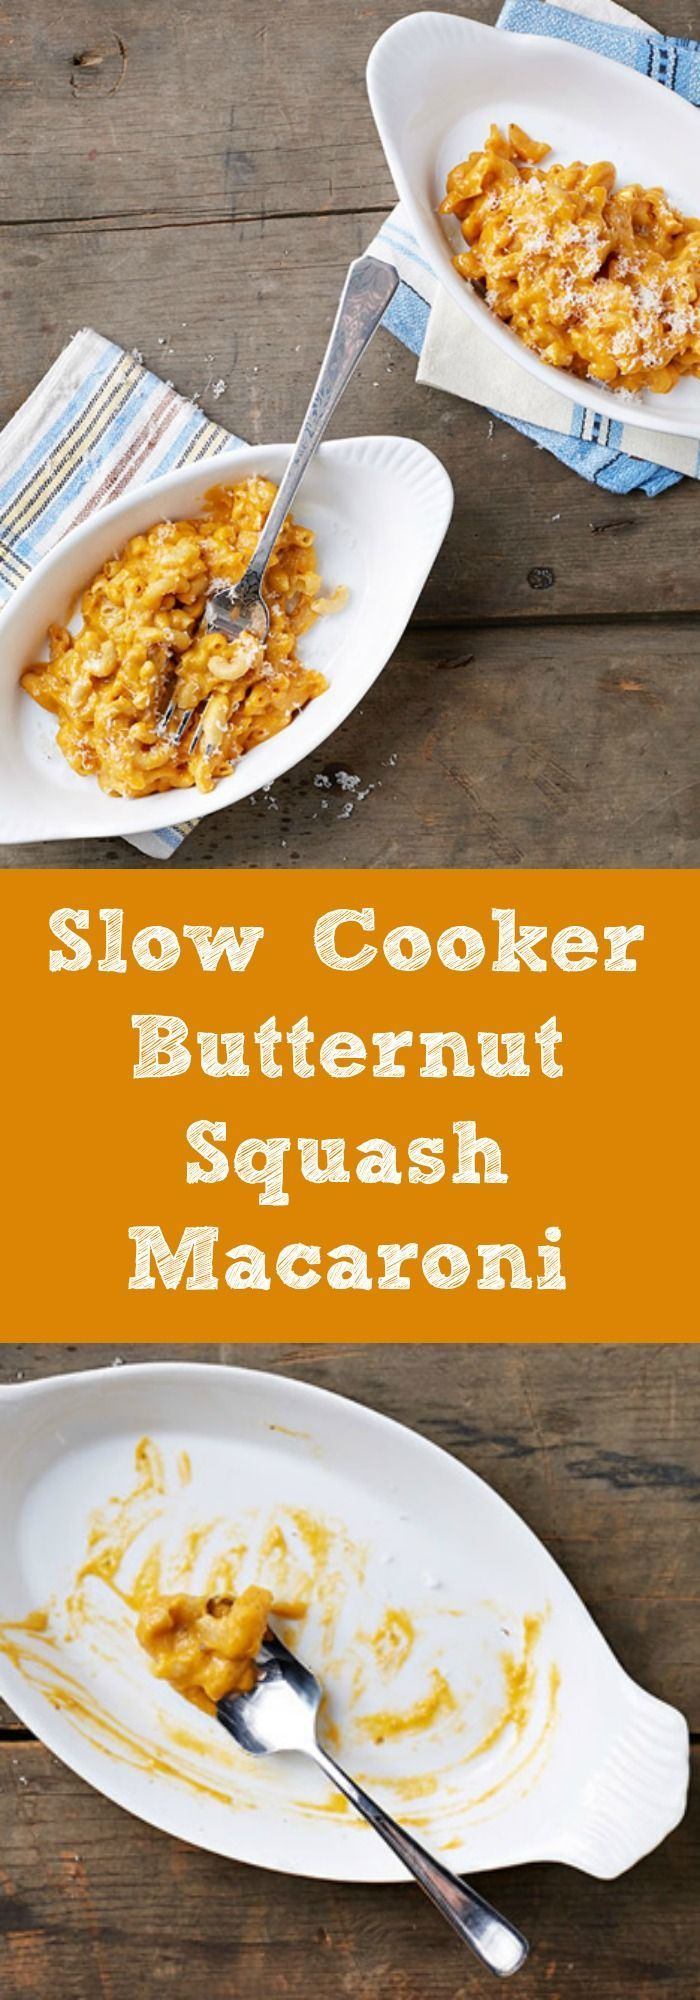 1132 best vegan slow cooker recipes images on pinterest vegan 1132 best vegan slow cooker recipes images on pinterest vegan slow cooker cooker recipes and vegan food forumfinder Gallery